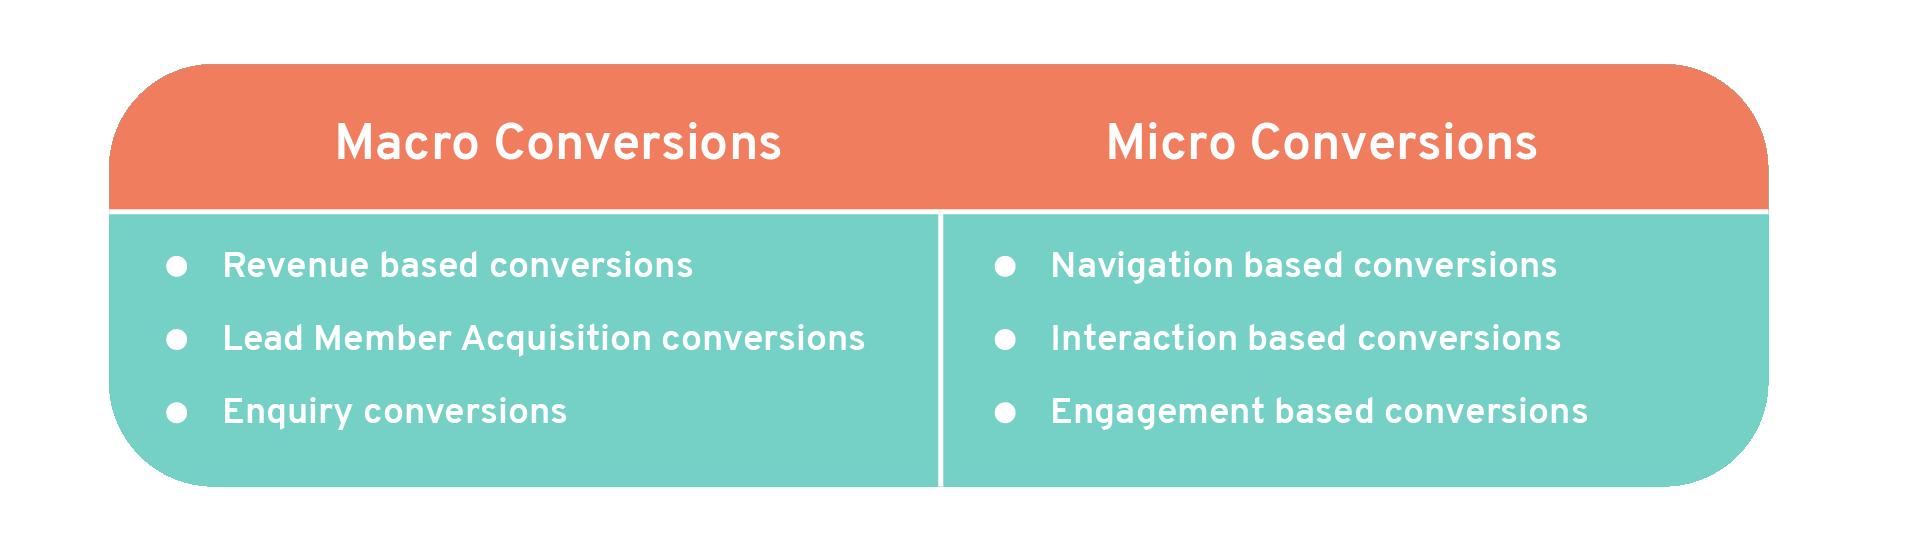 macro conversions vs micro conversions